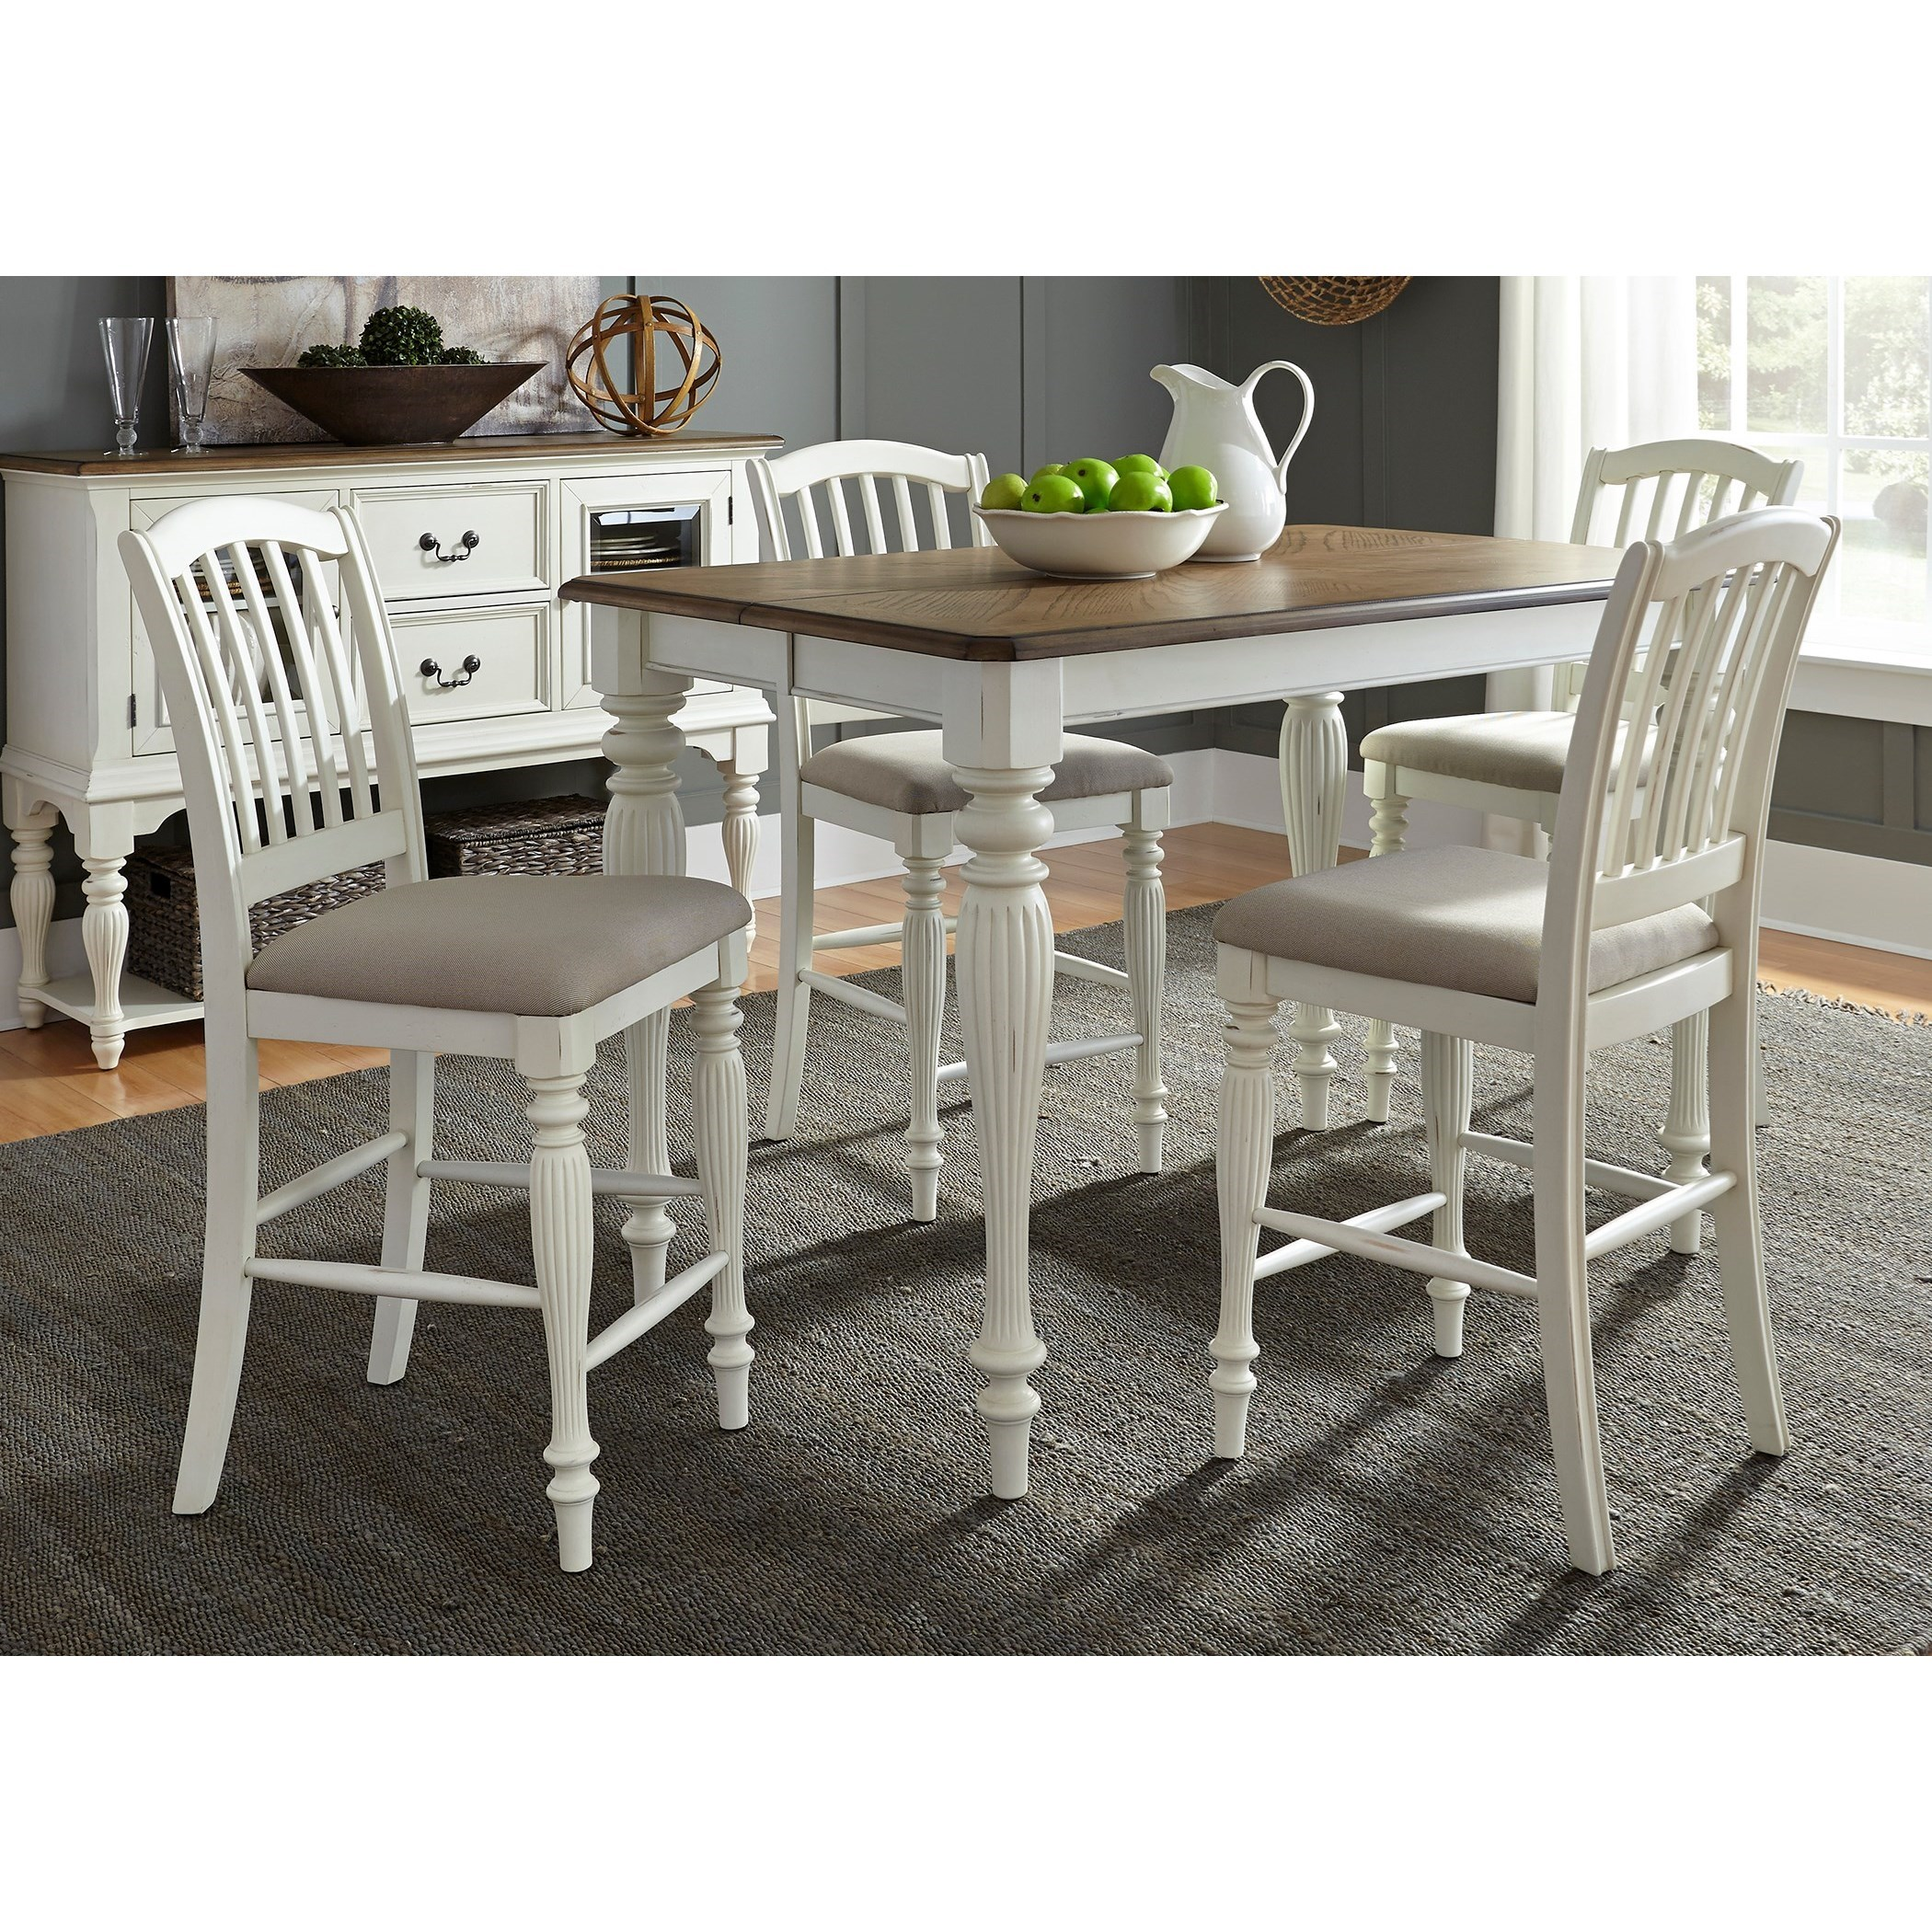 Liberty Furniture Cumberland Creek Dining 5 Piece Gathering Table Set  - Item Number: 334-CD-5GTS